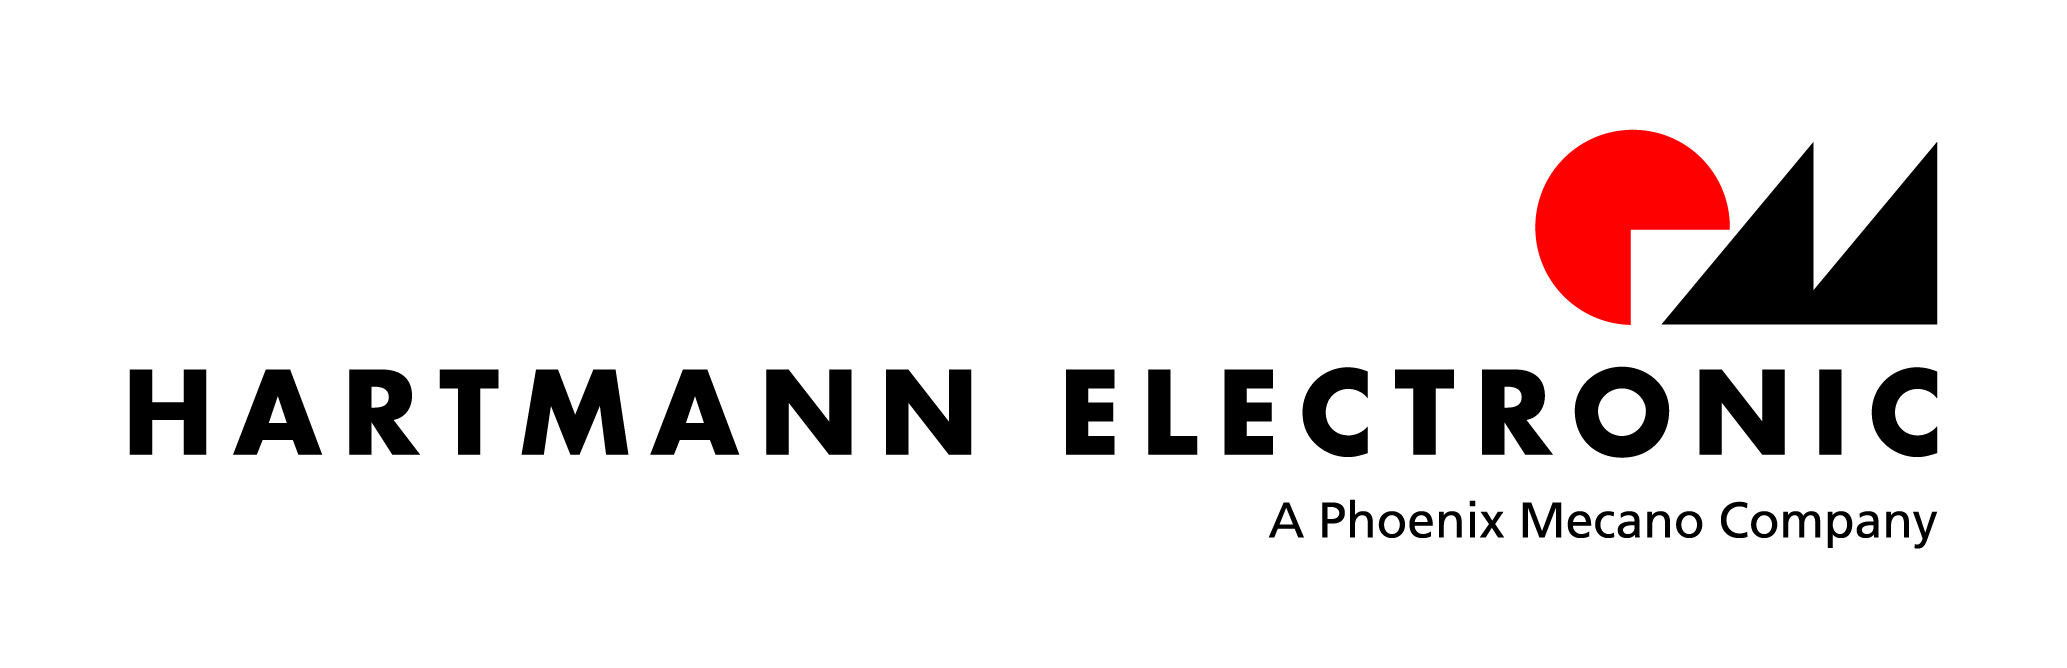 Hartmann Electronic GmbH